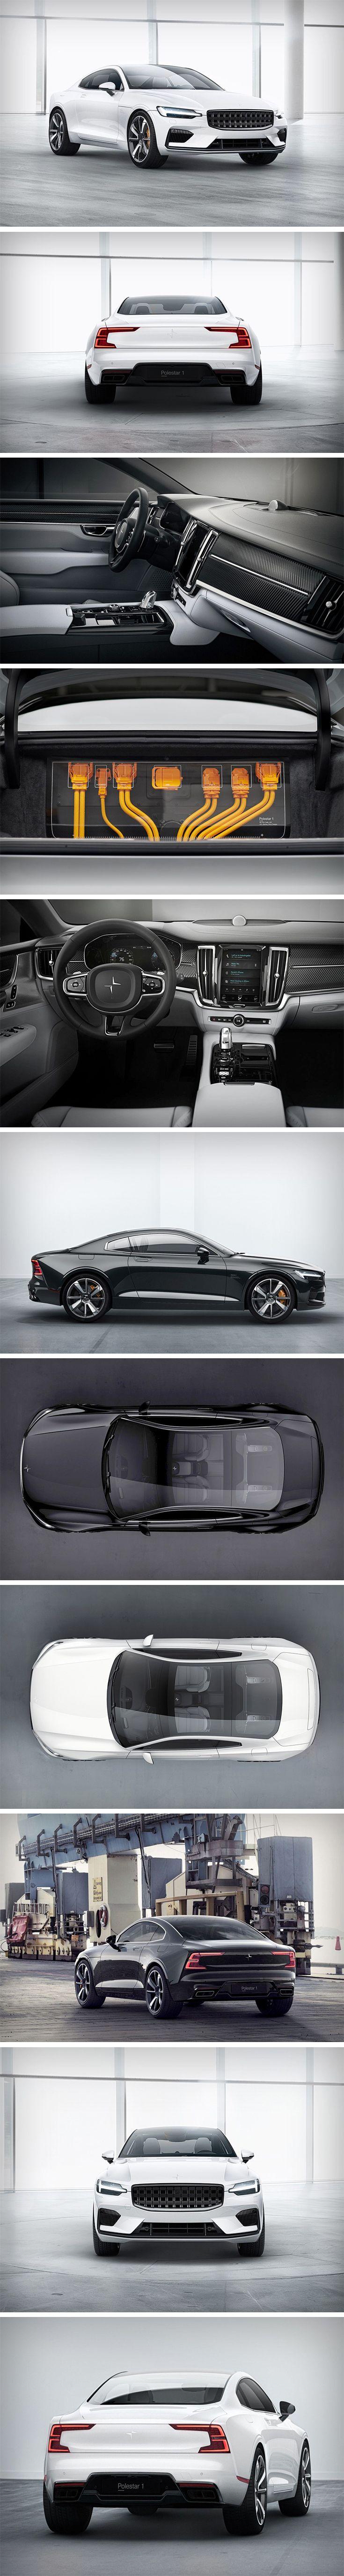 363 best Modern Vehicles images on Pinterest